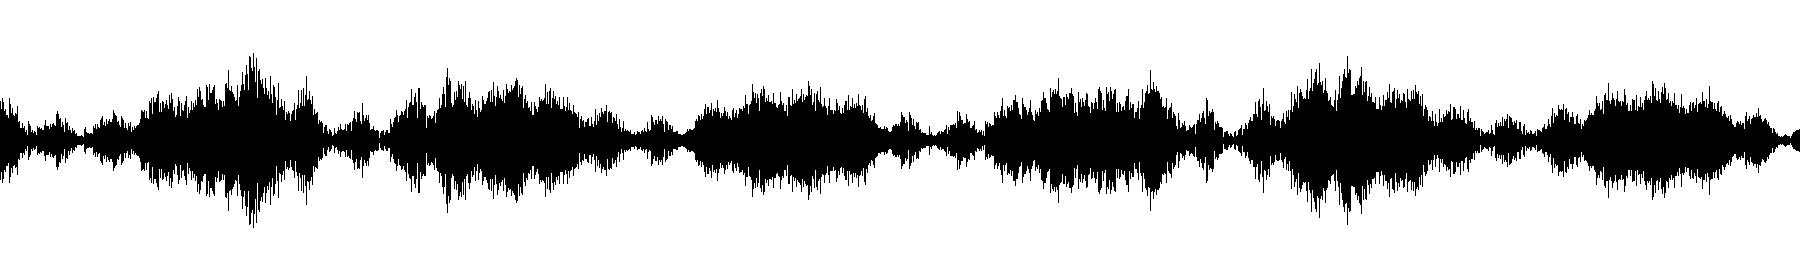 92 d synthfiltchords sp 01